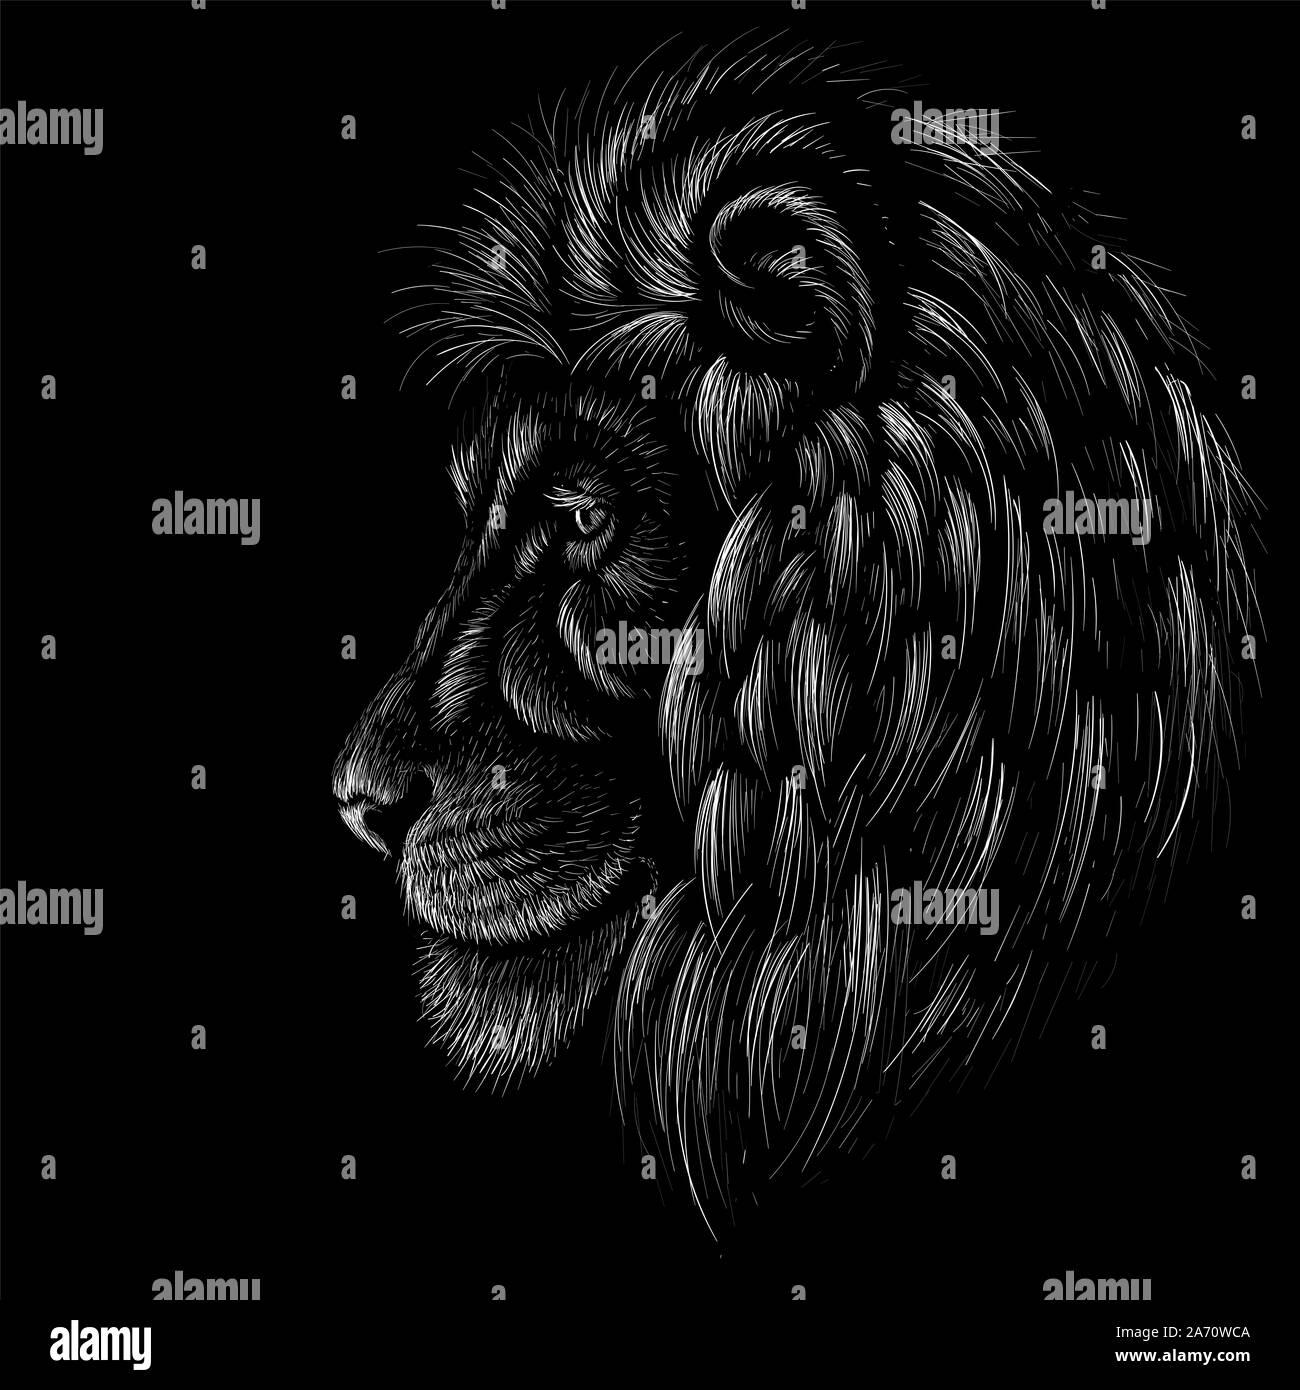 Como Hacer Un Diseño Para Tatuaje el vector logo león para tatuaje o t-shirt de impresión o de